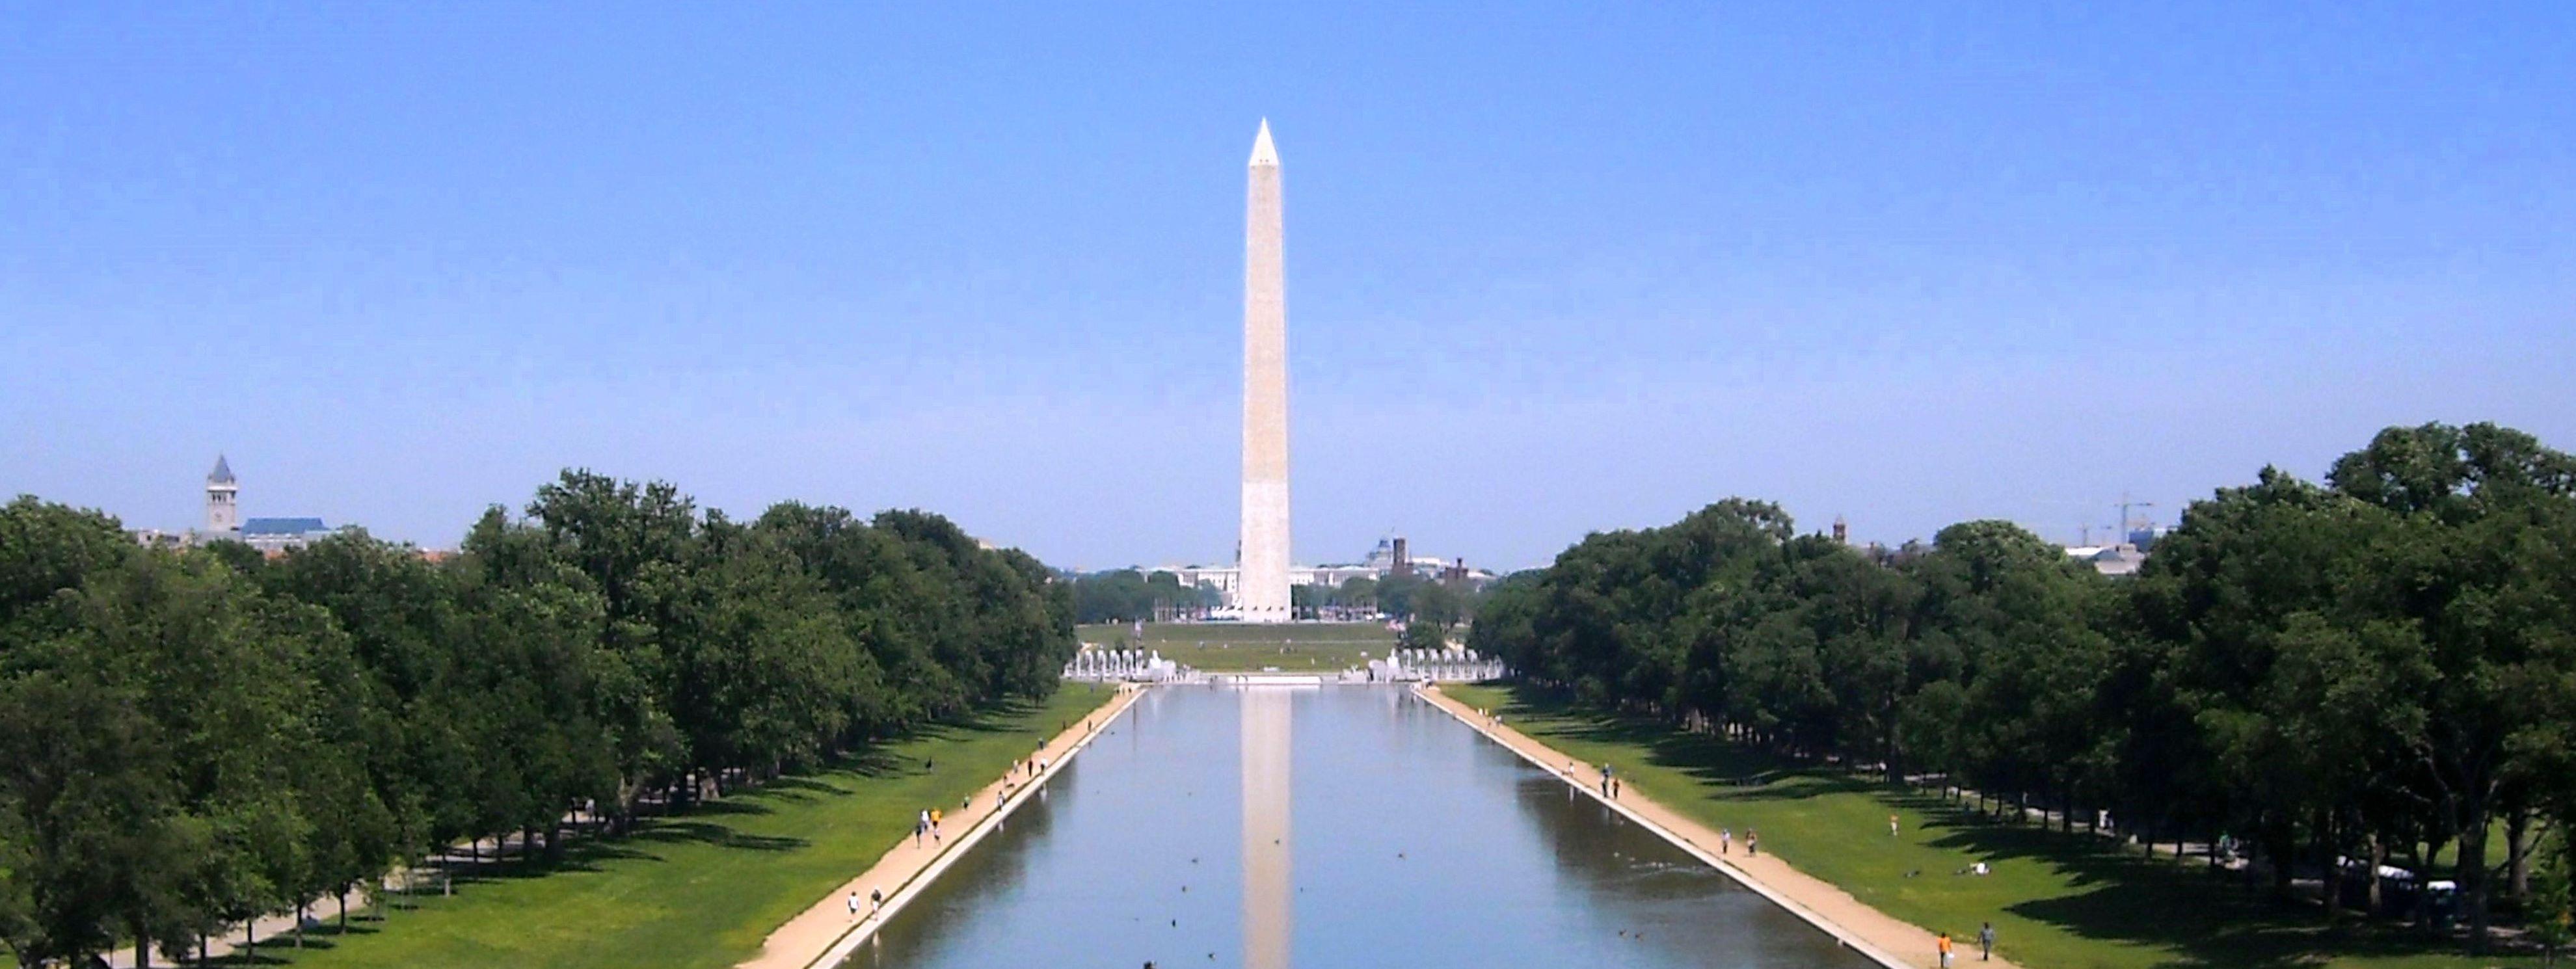 File:Washington Monument Panorama.jpg - Wikimedia Commons